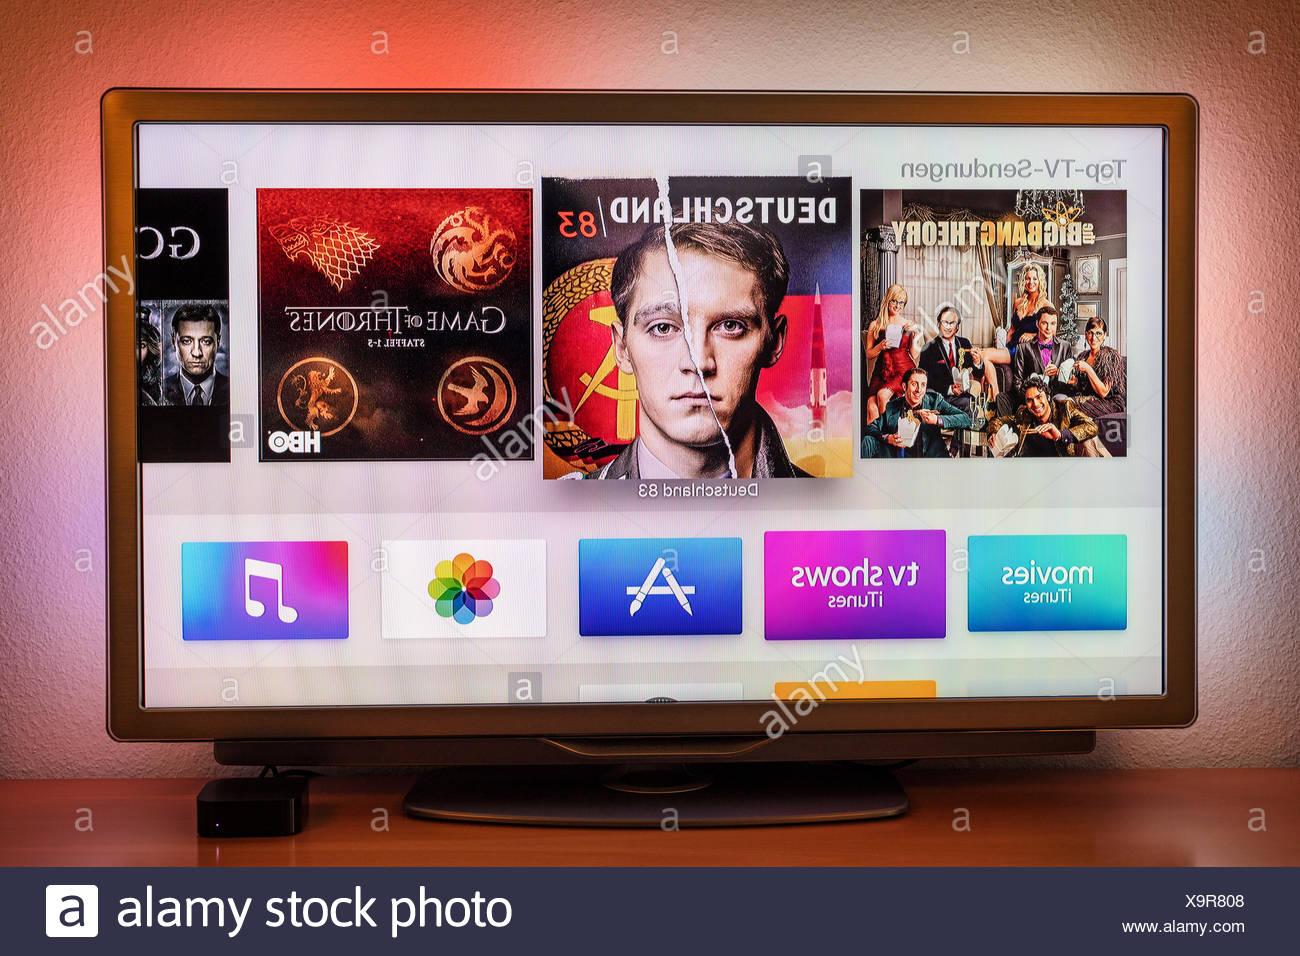 Apple TV on 4th generation LCD TVs, TV program, top TV shows - Stock Image